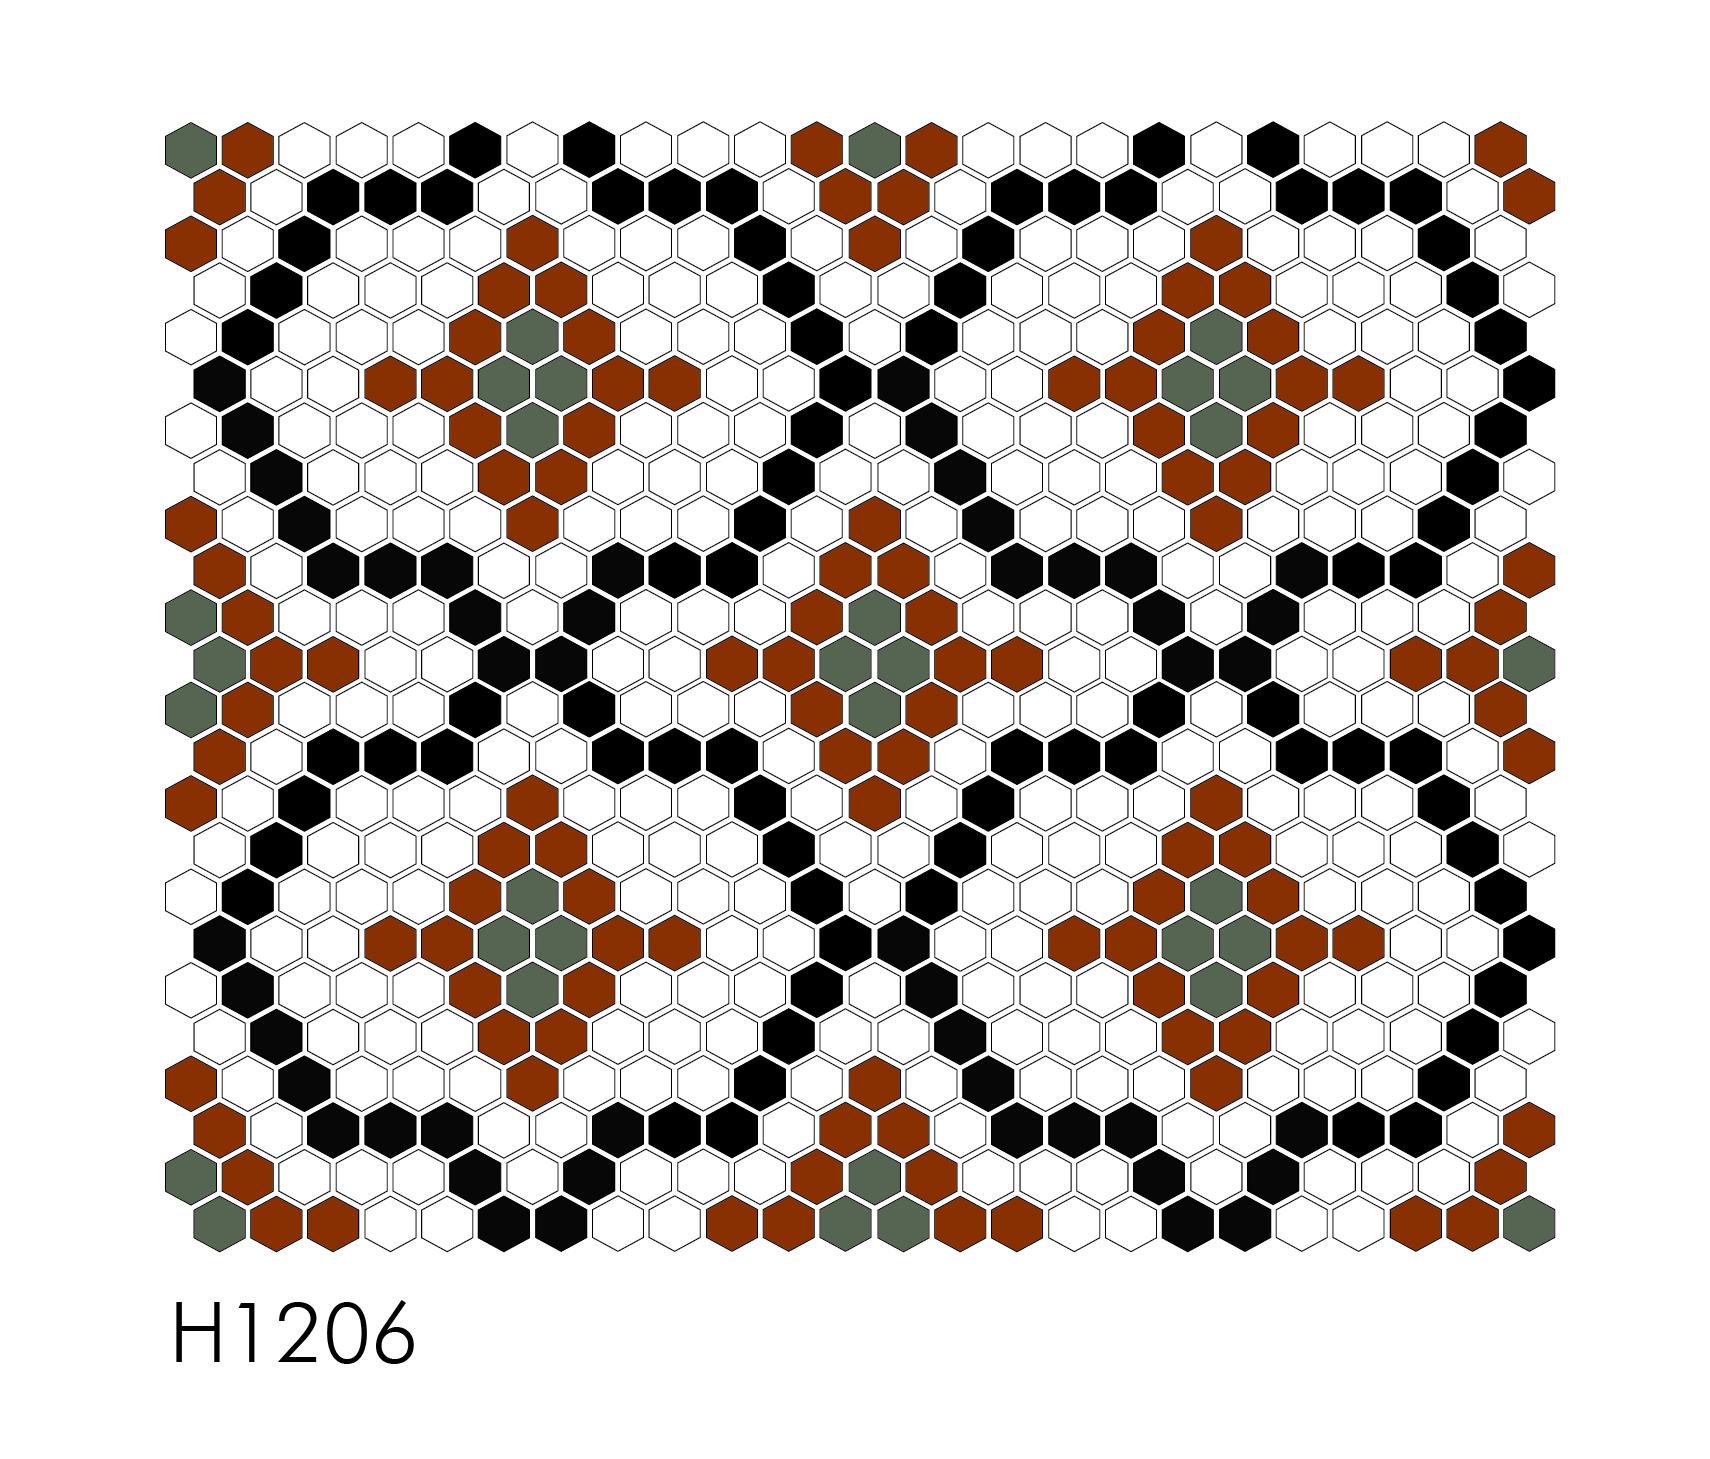 "H1206 1"" Hexagon Mosaic"